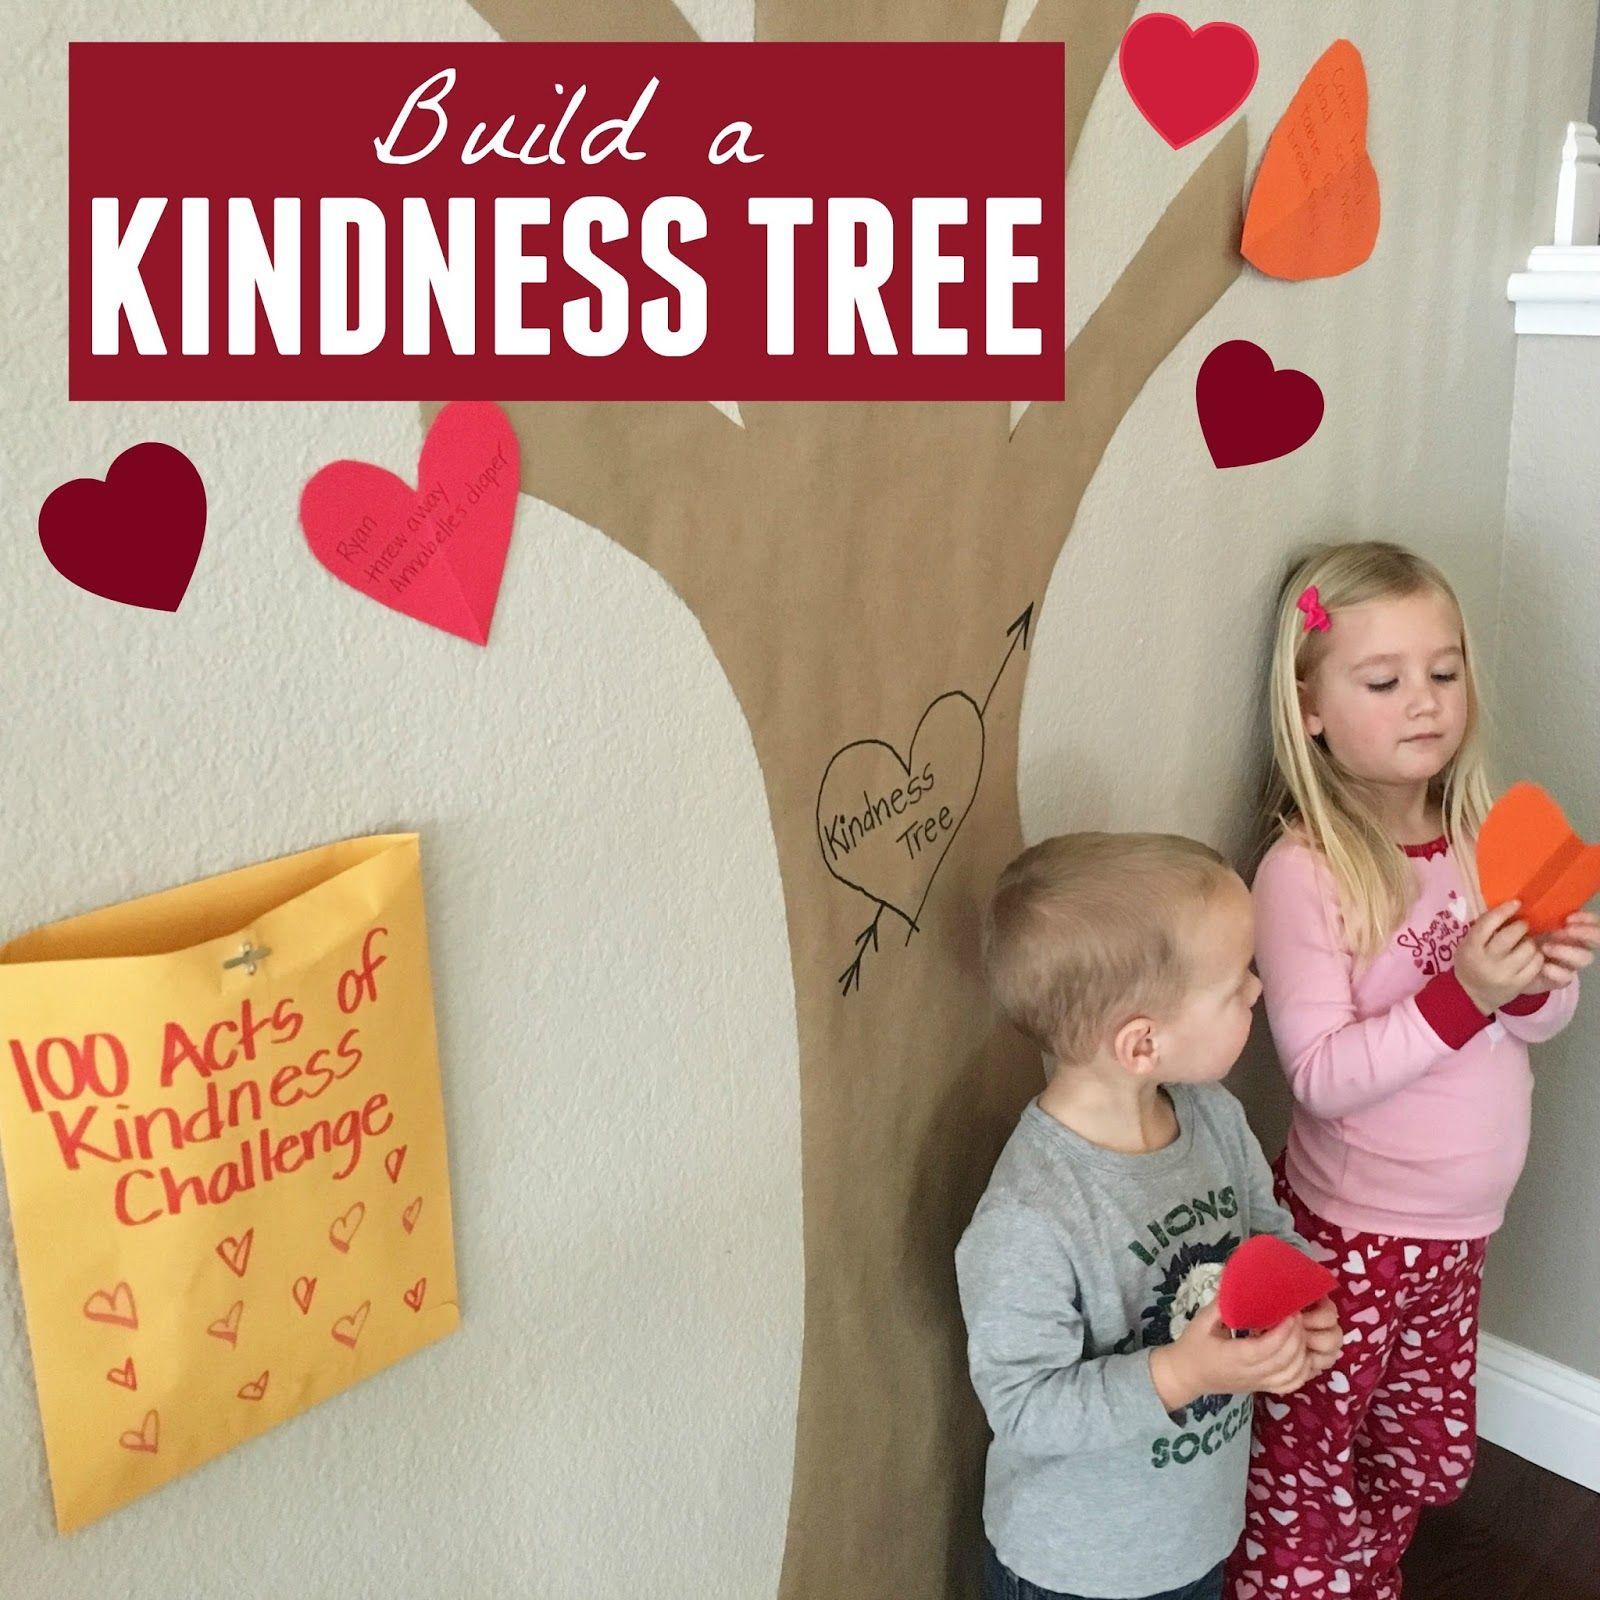 Build A Kindness Tree